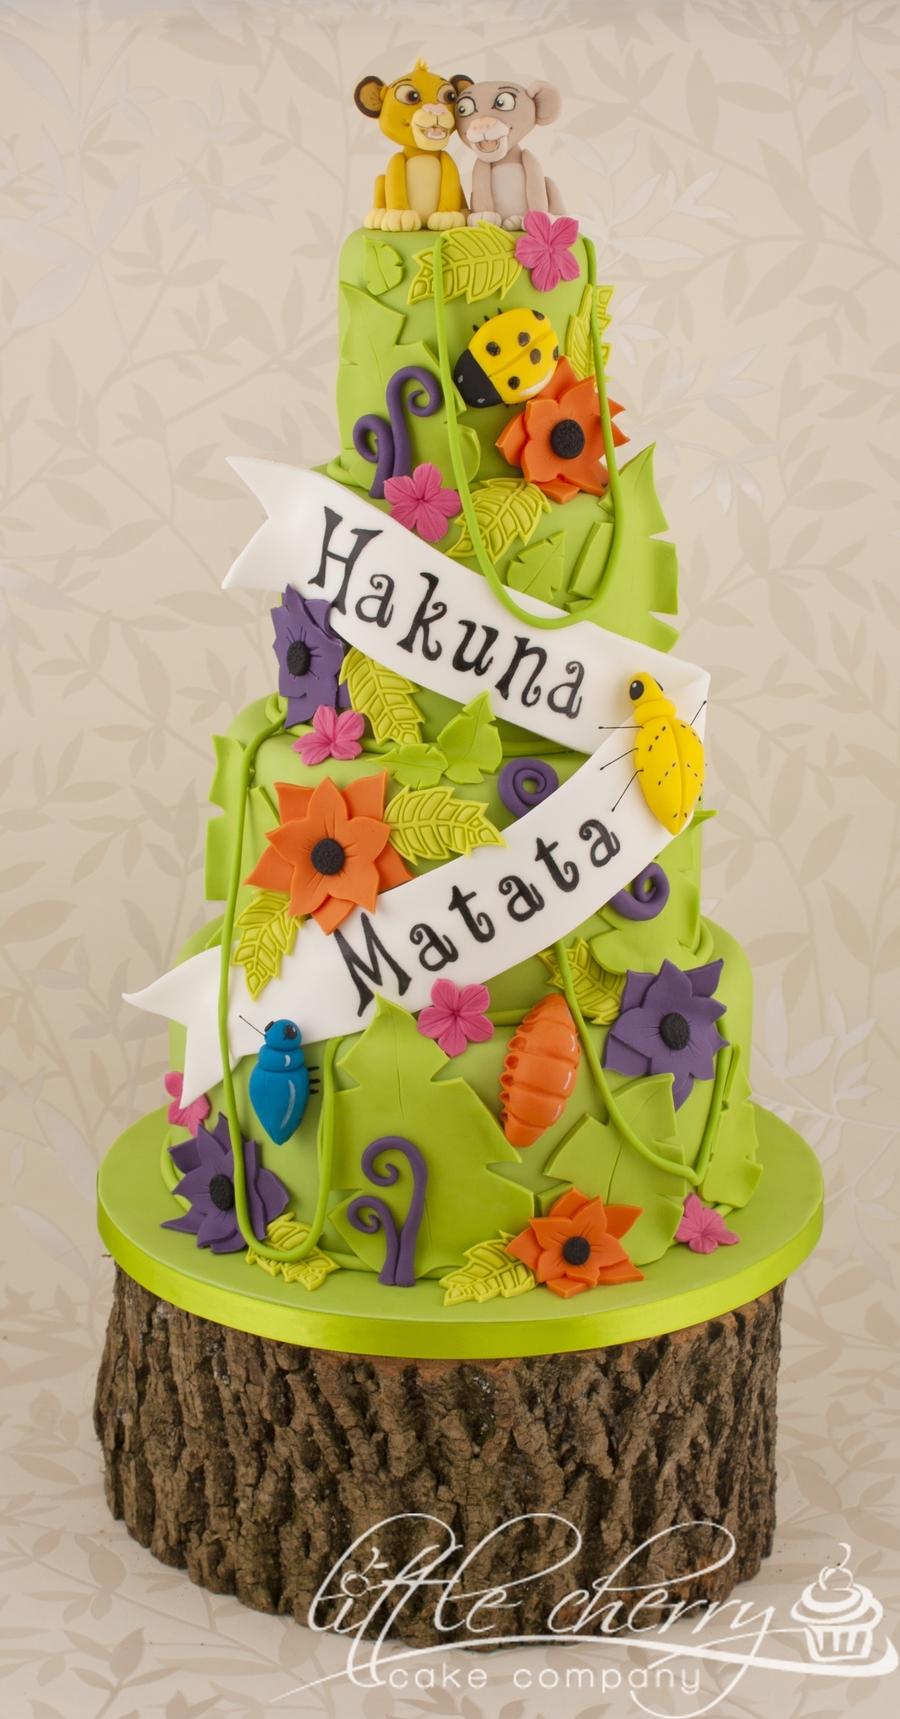 Lion King Hakuna Matata Wedding Cake CakeCentralcom - Lion King Wedding Cake